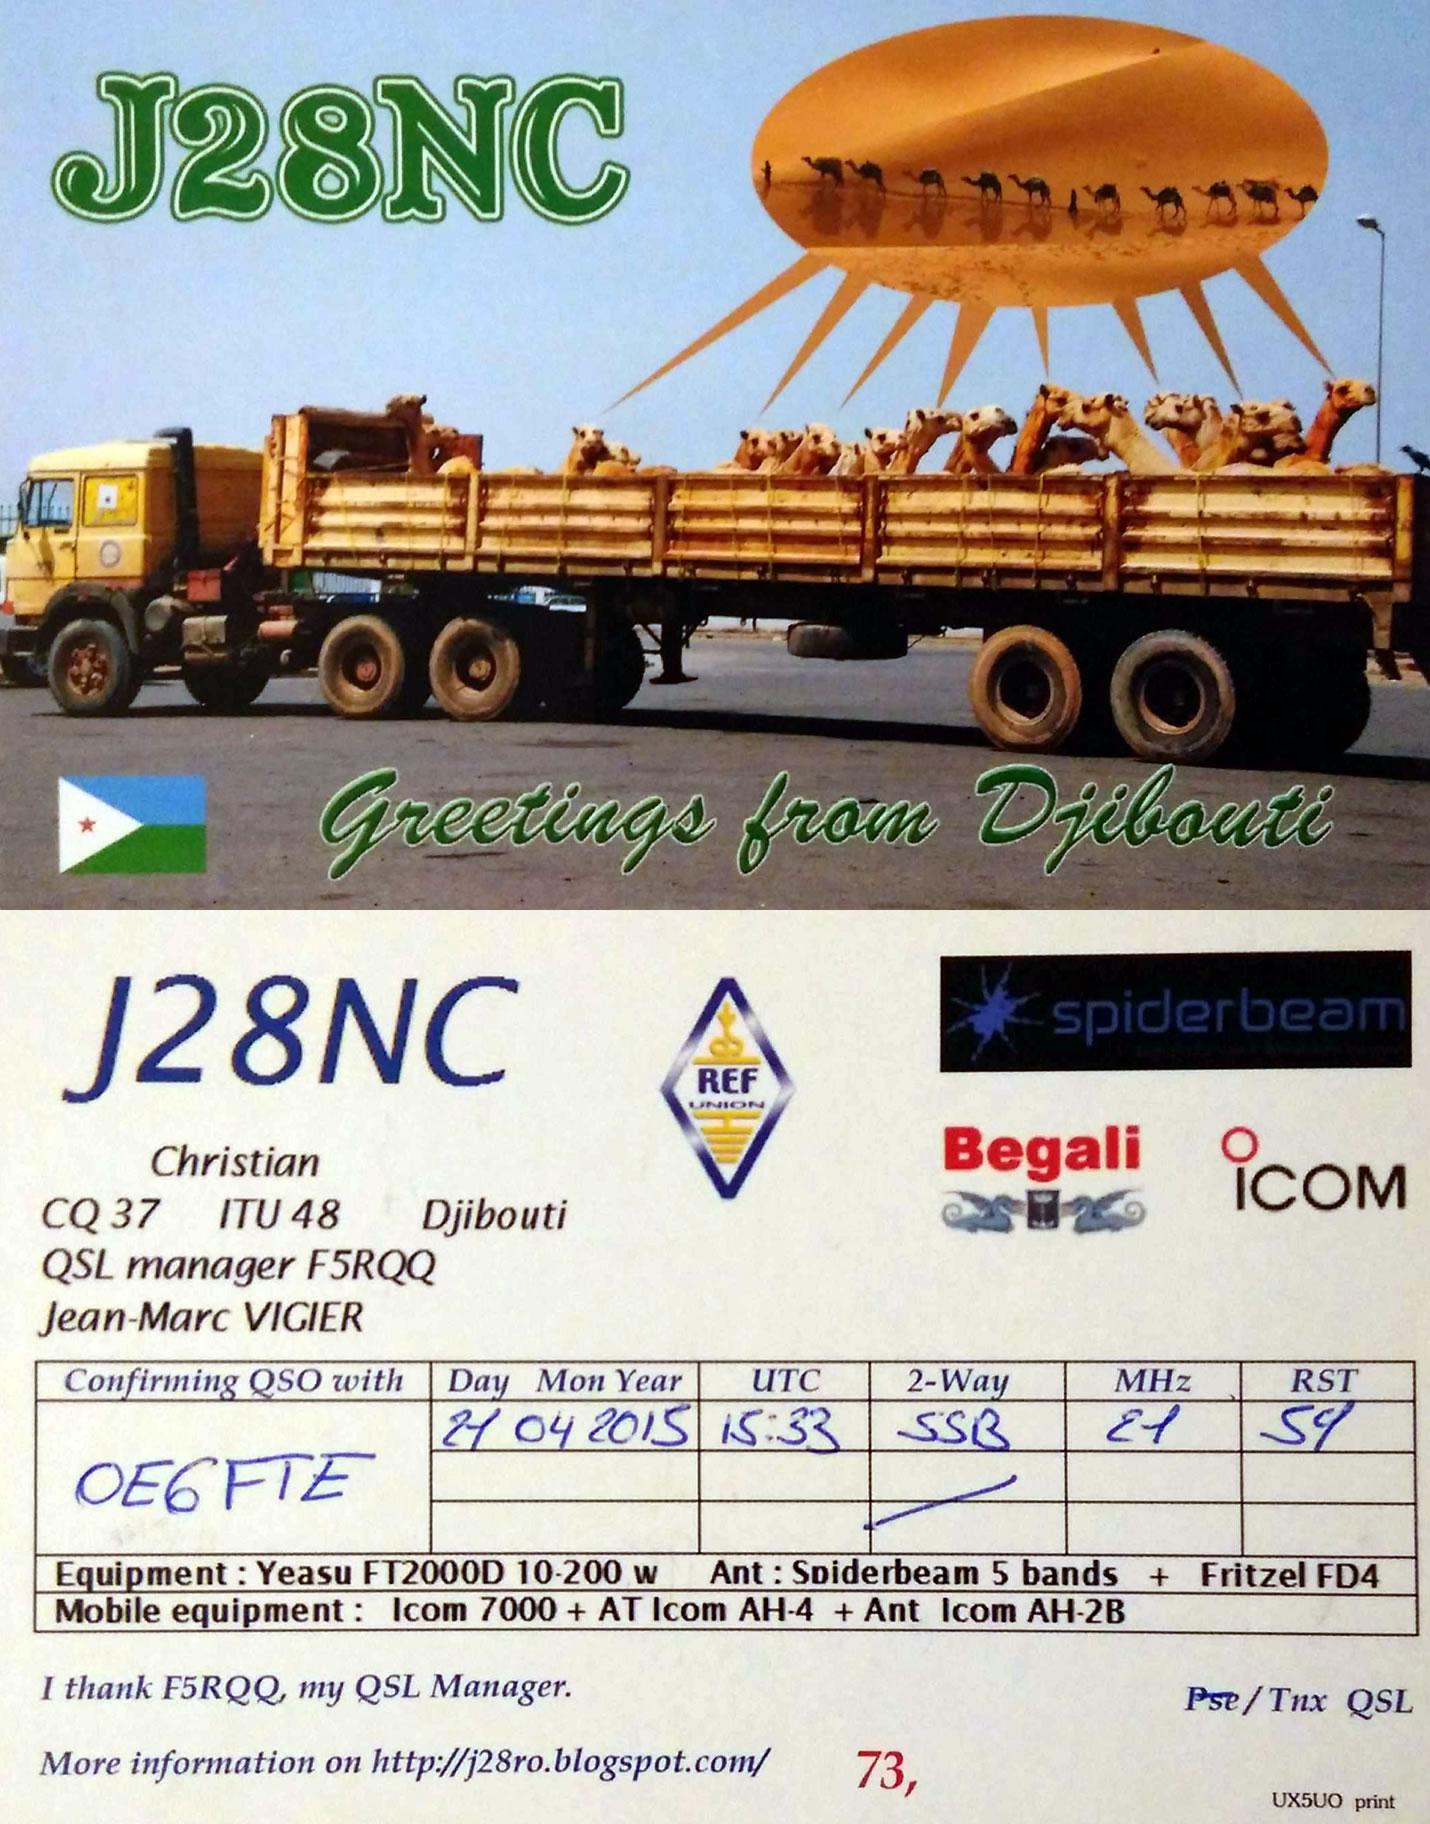 J28NC